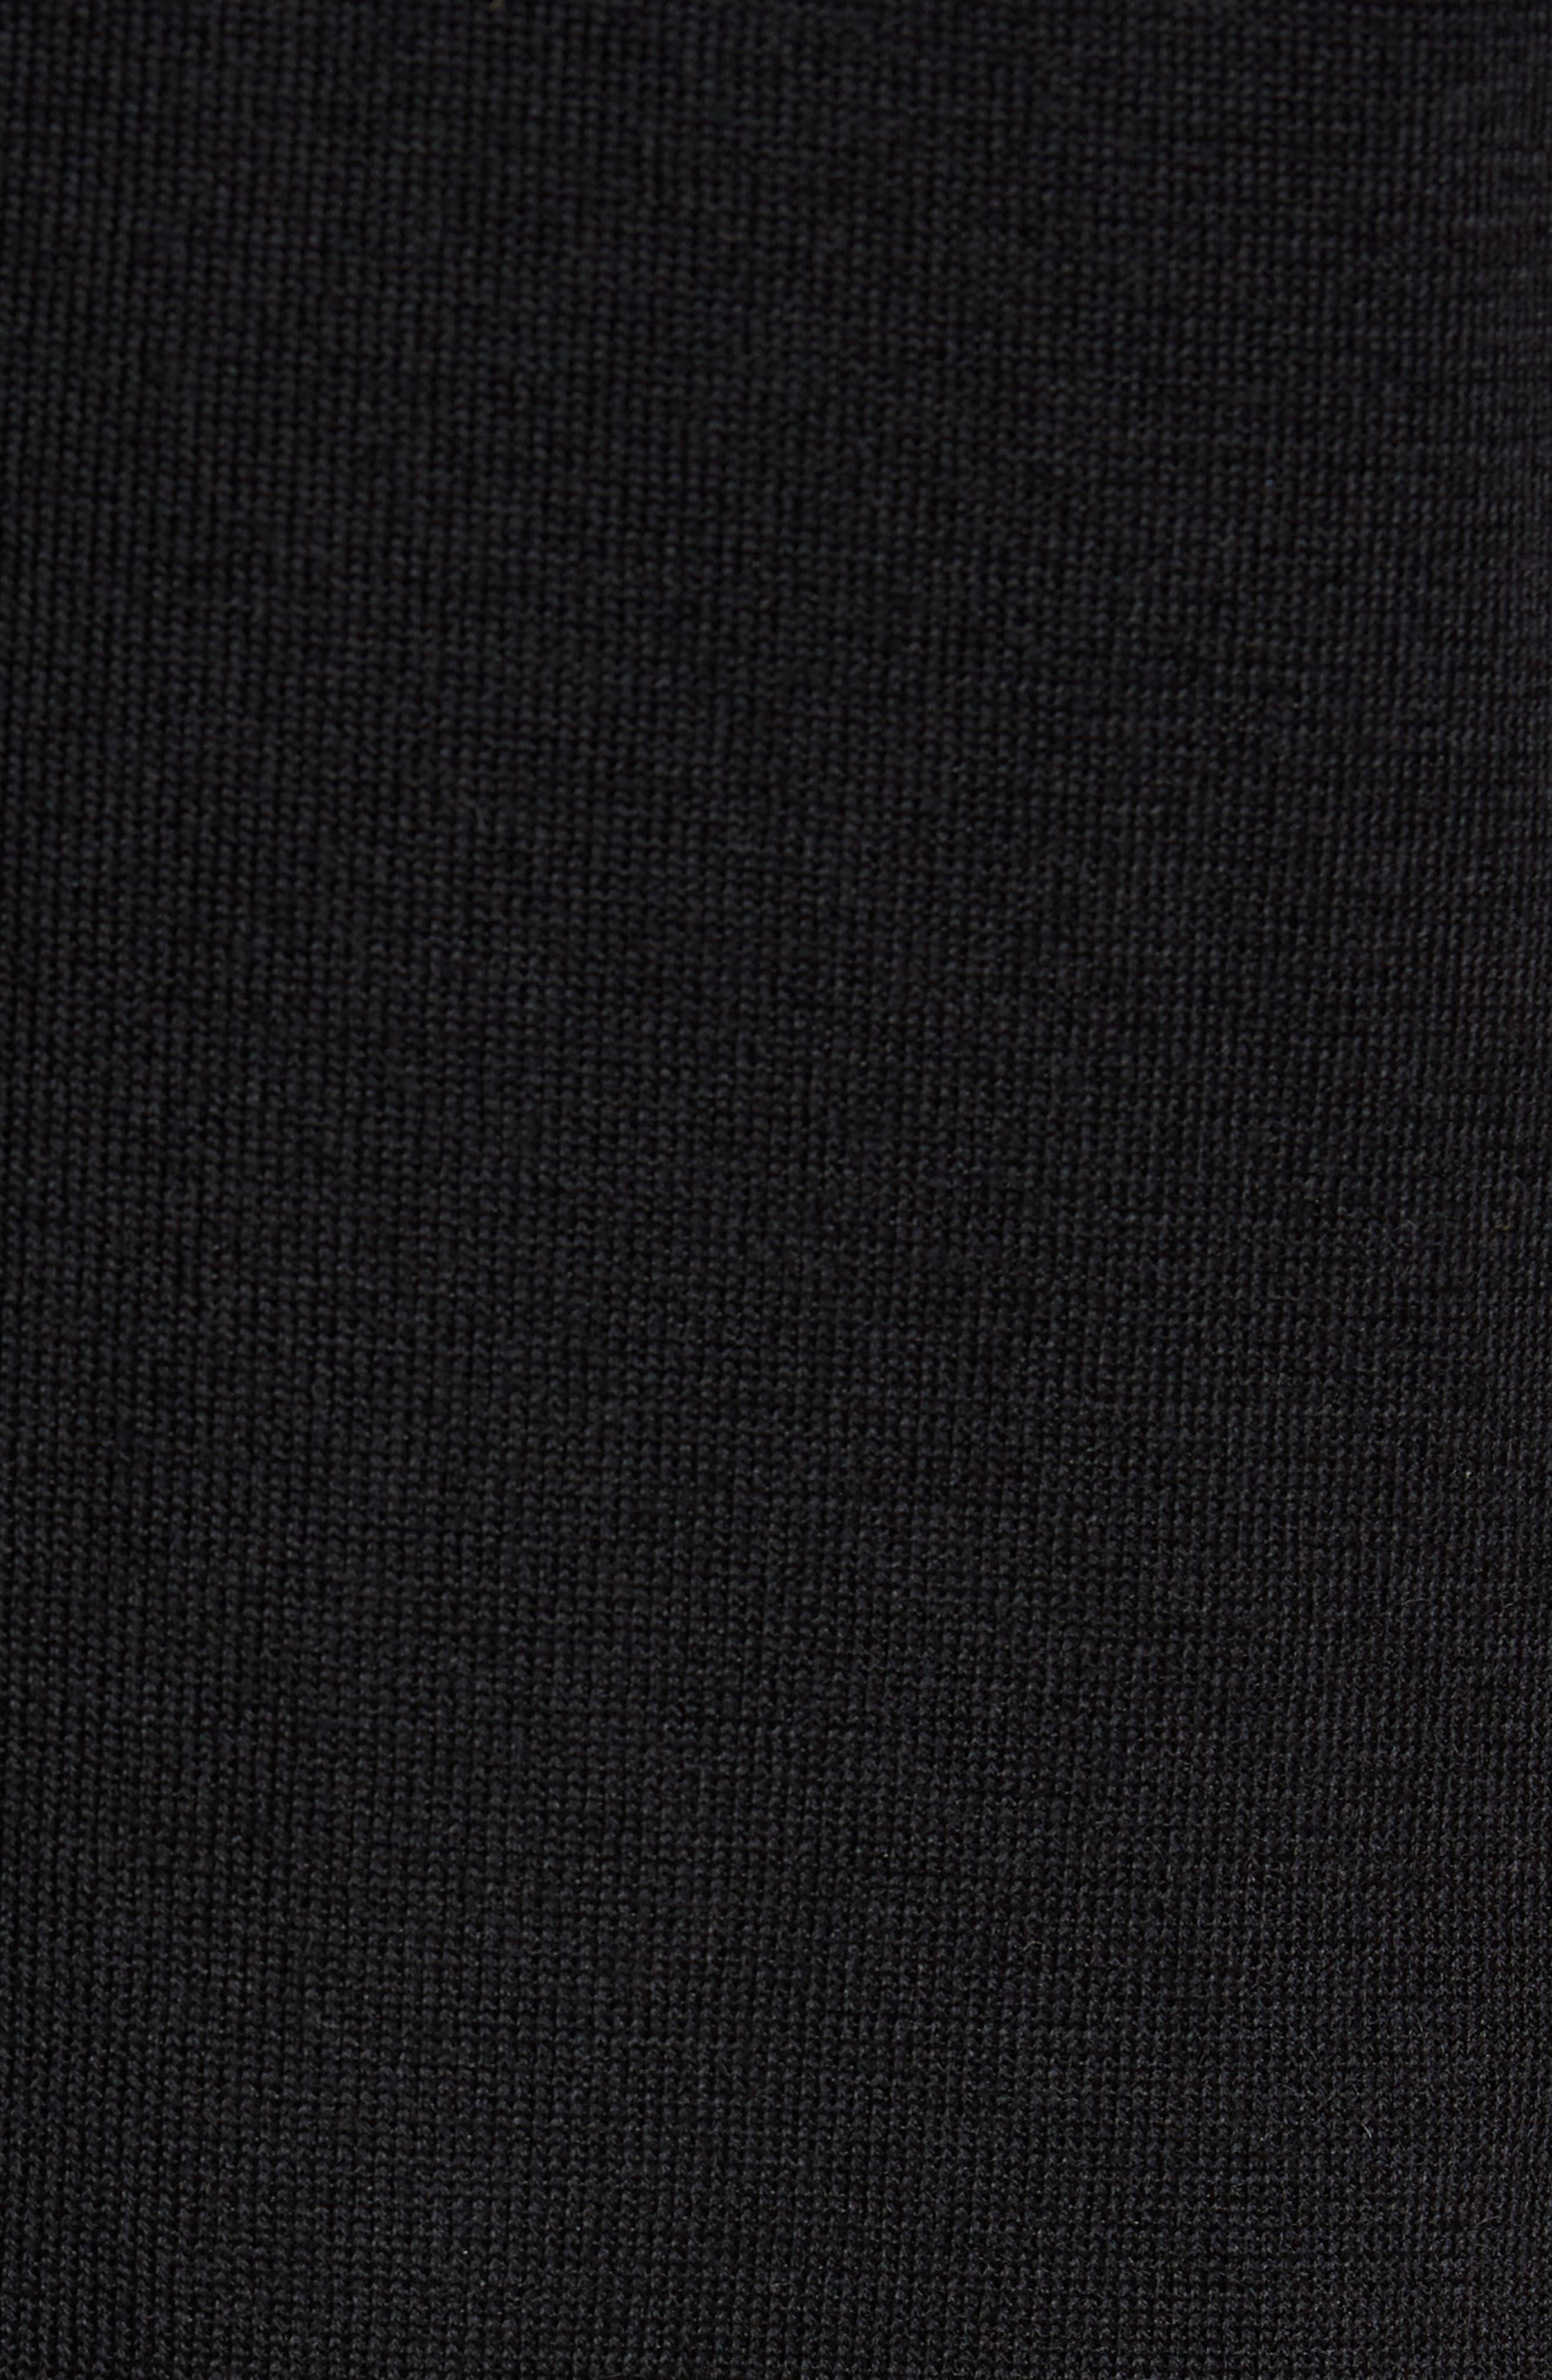 Jones Aim Hybrid Classic Fit Knit Wool Blend Blazer,                             Alternate thumbnail 6, color,                             001